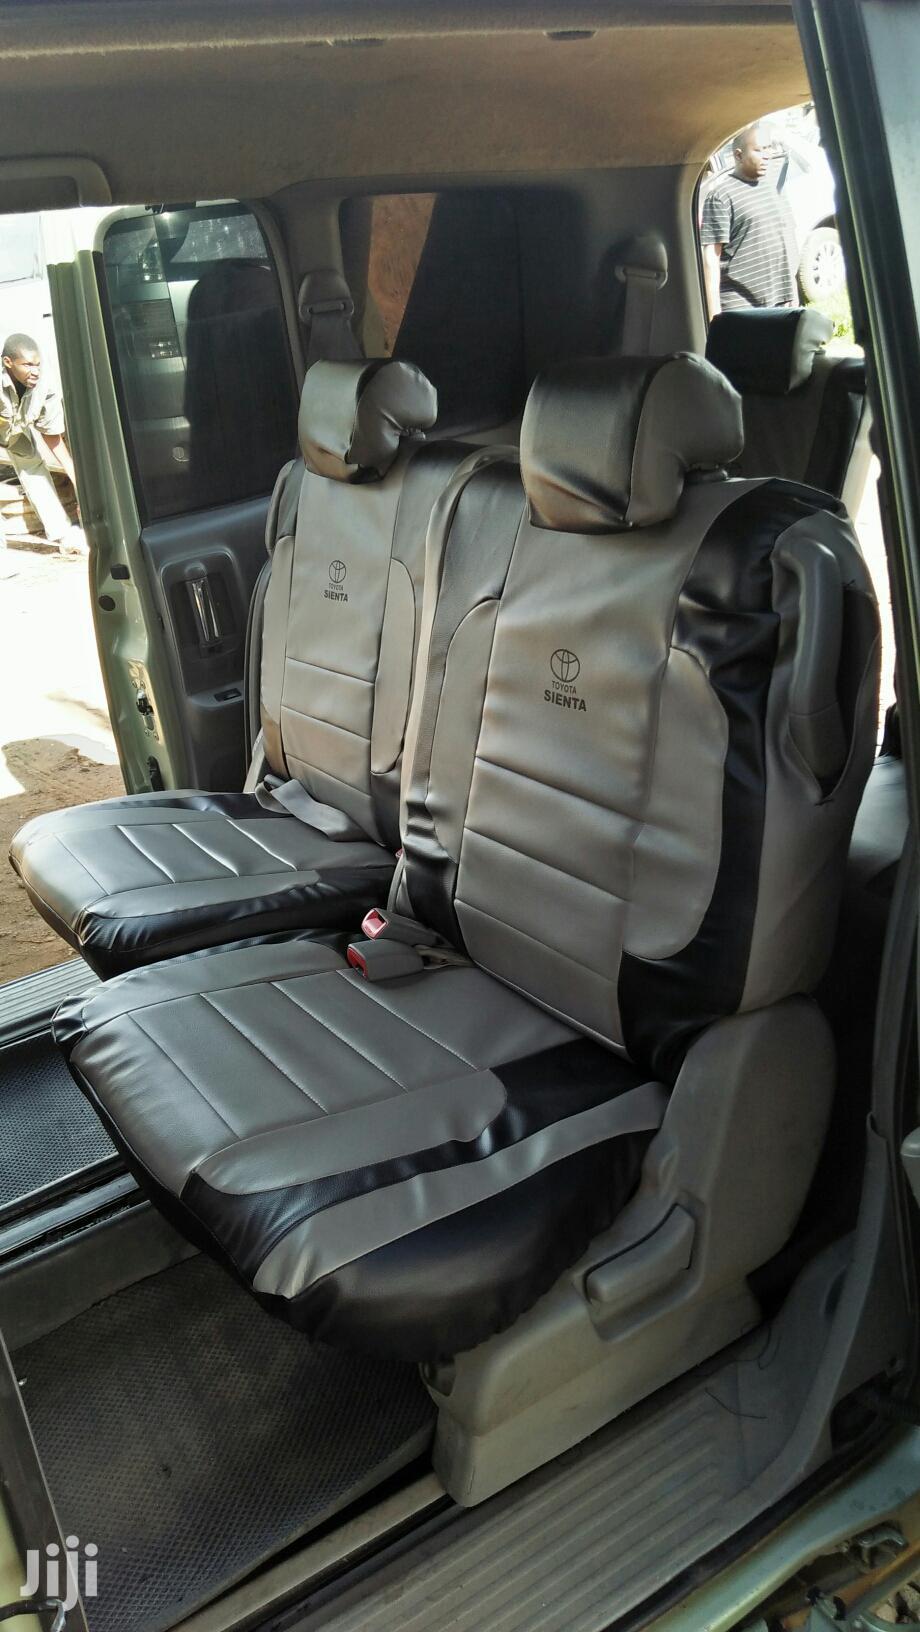 Bamburi Car Seat Covers | Vehicle Parts & Accessories for sale in Kisauni, Mombasa, Kenya